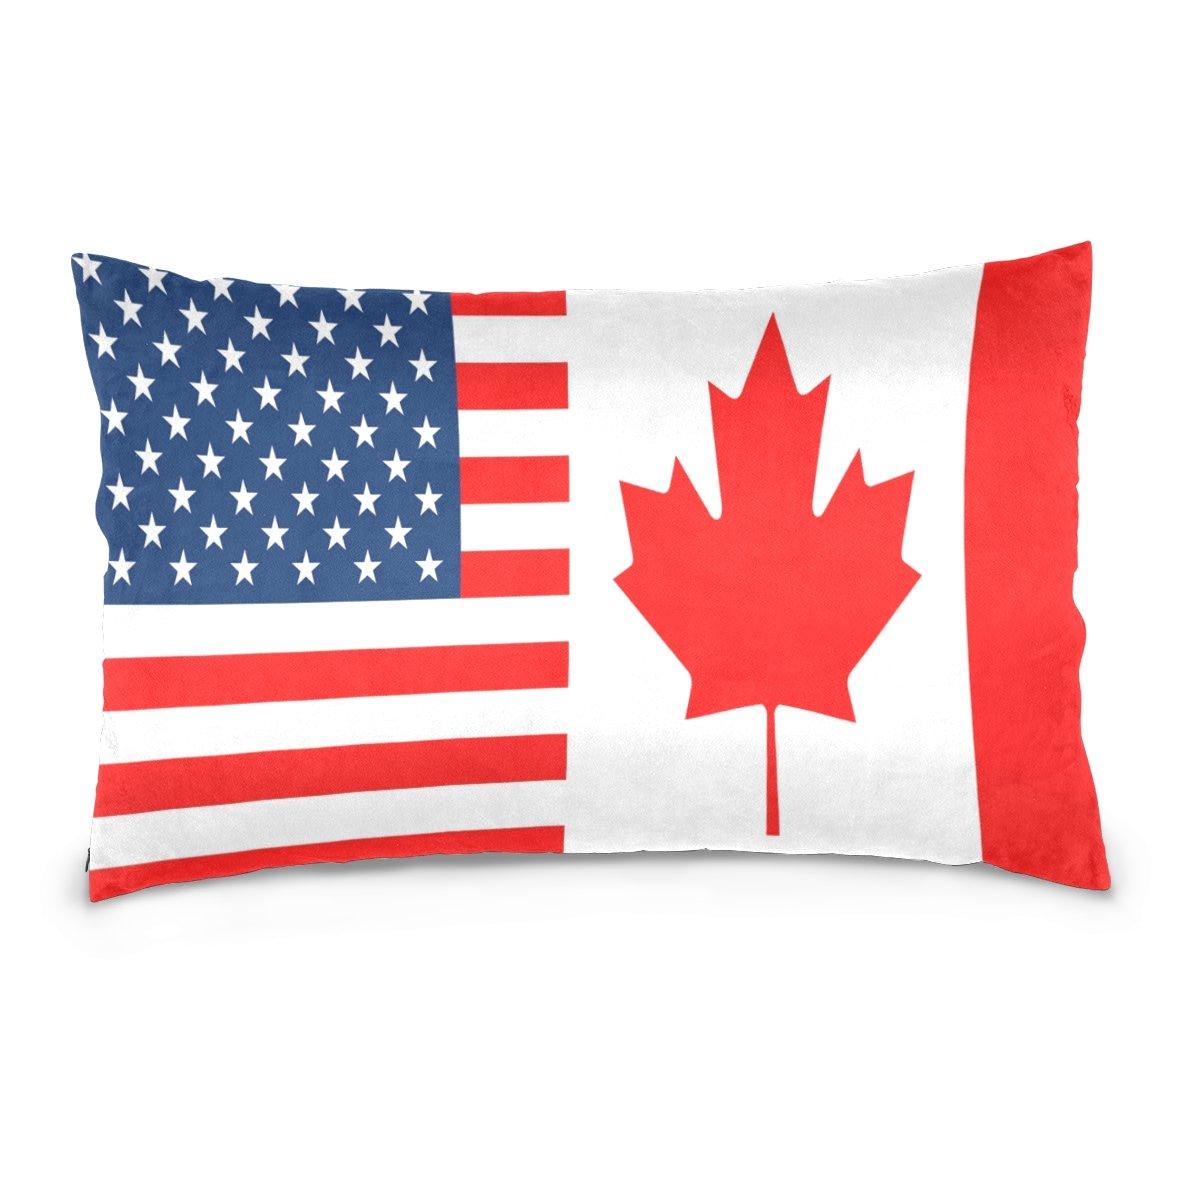 Alaza両面USA Flagカナダ国旗コットンベルベット枕カバー正方形と長方形標準サイズソファウエストスロークッションカバーホーム飾り 16x24 B07BMMYYMR  マルチ-1 16x24